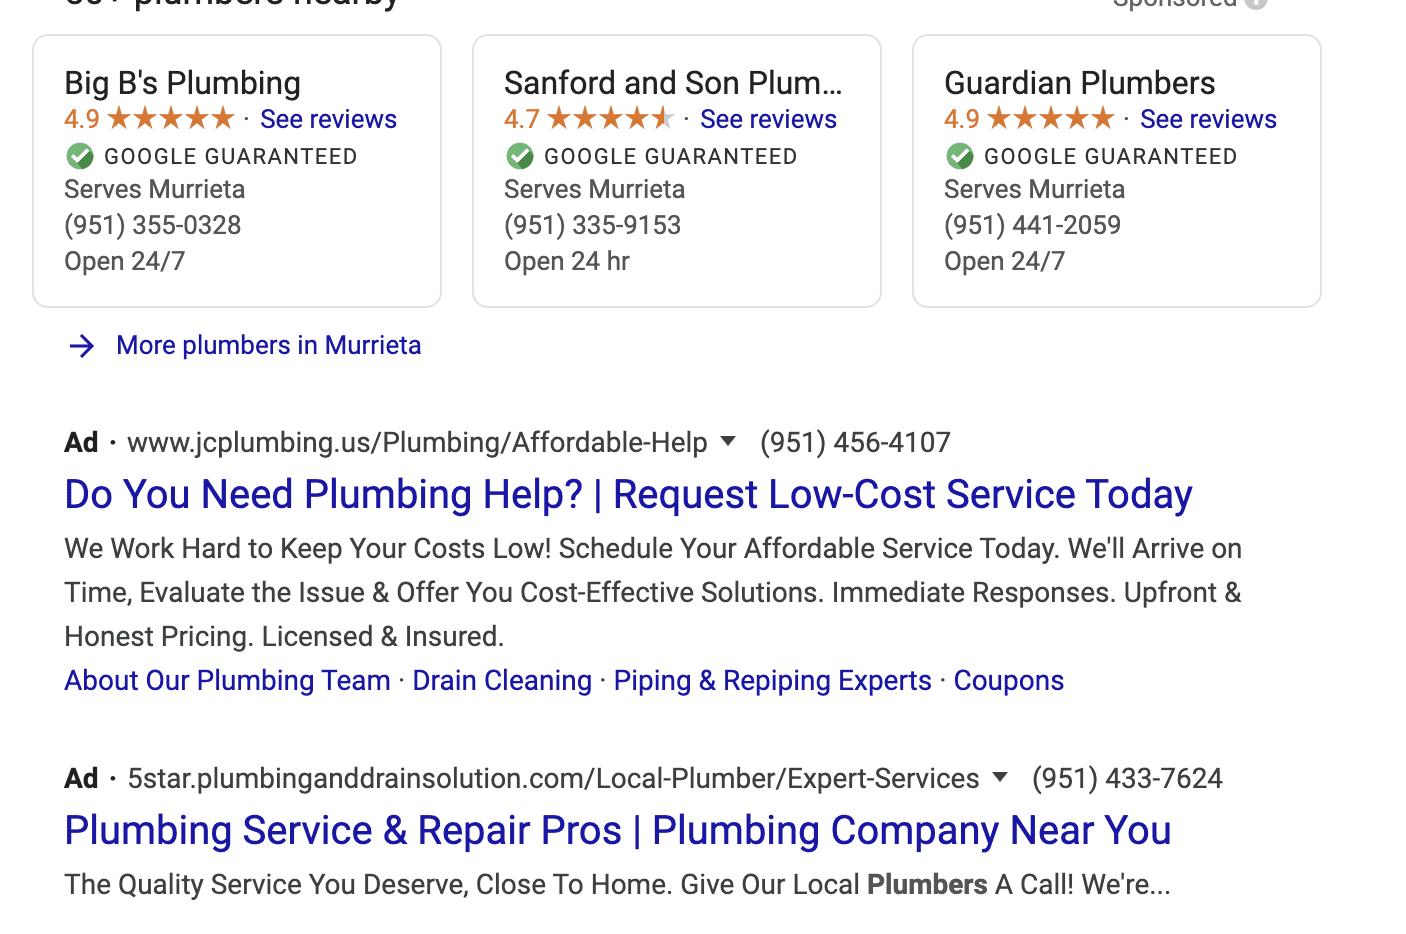 Future of plumbing